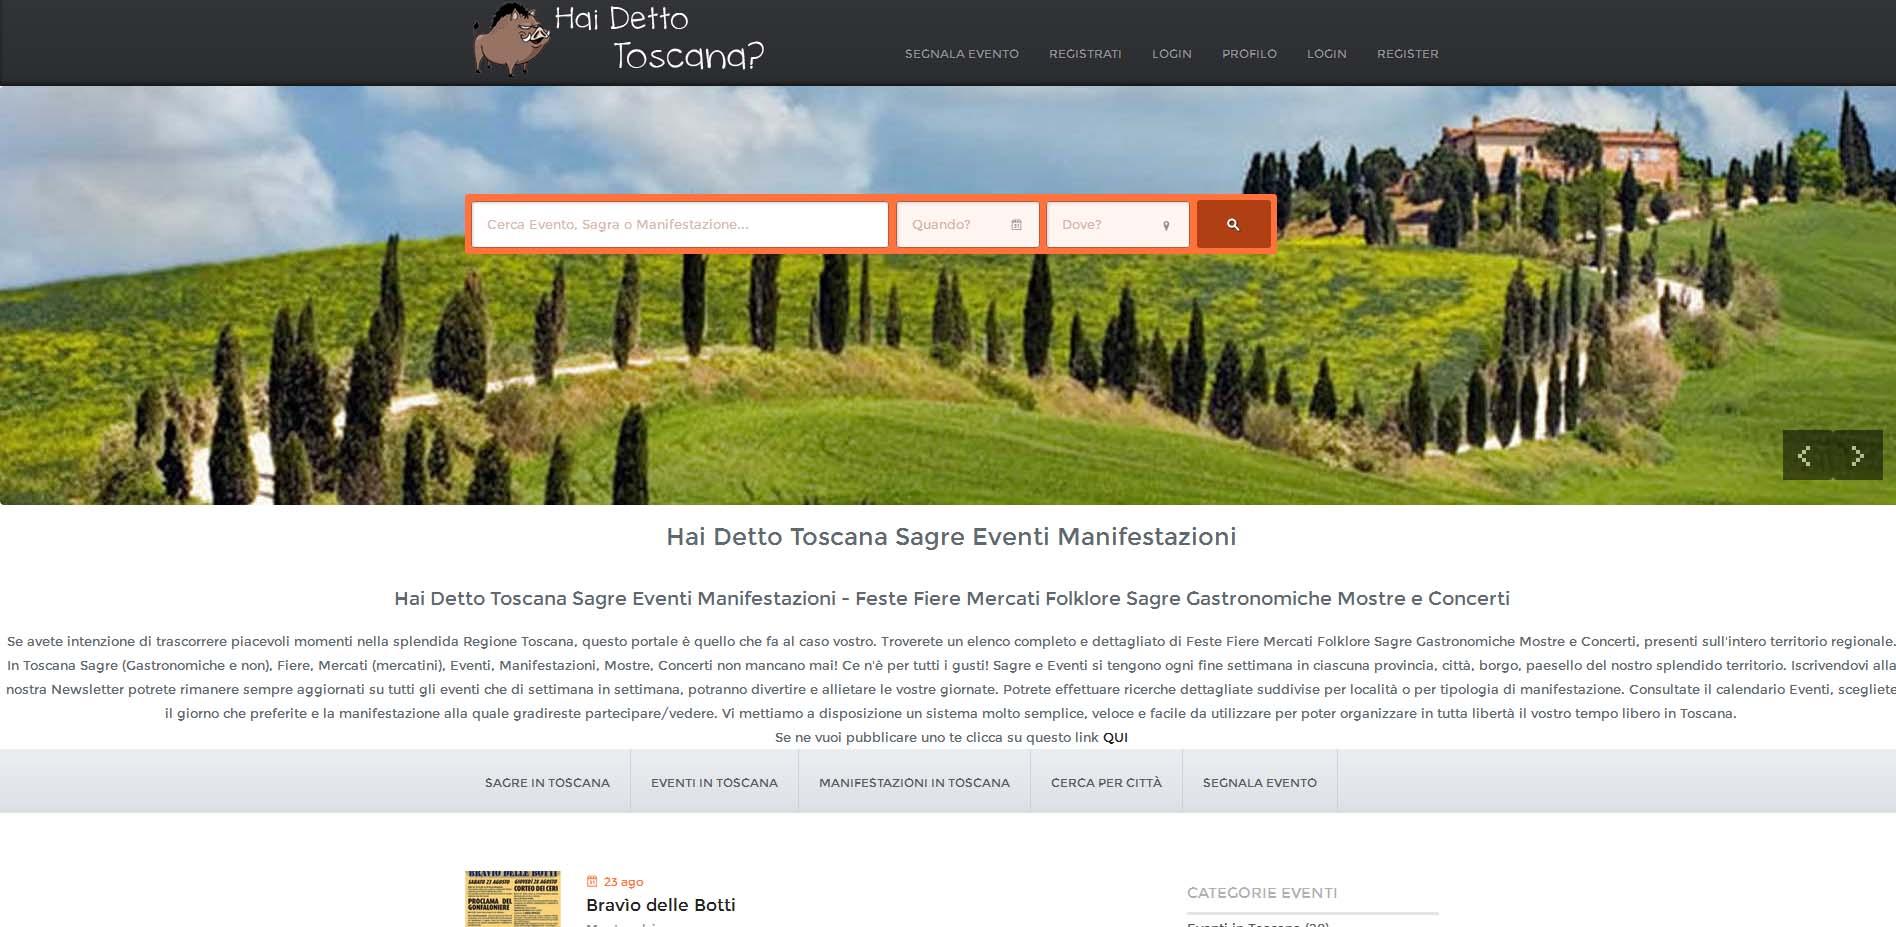 Hai Detto Toscana